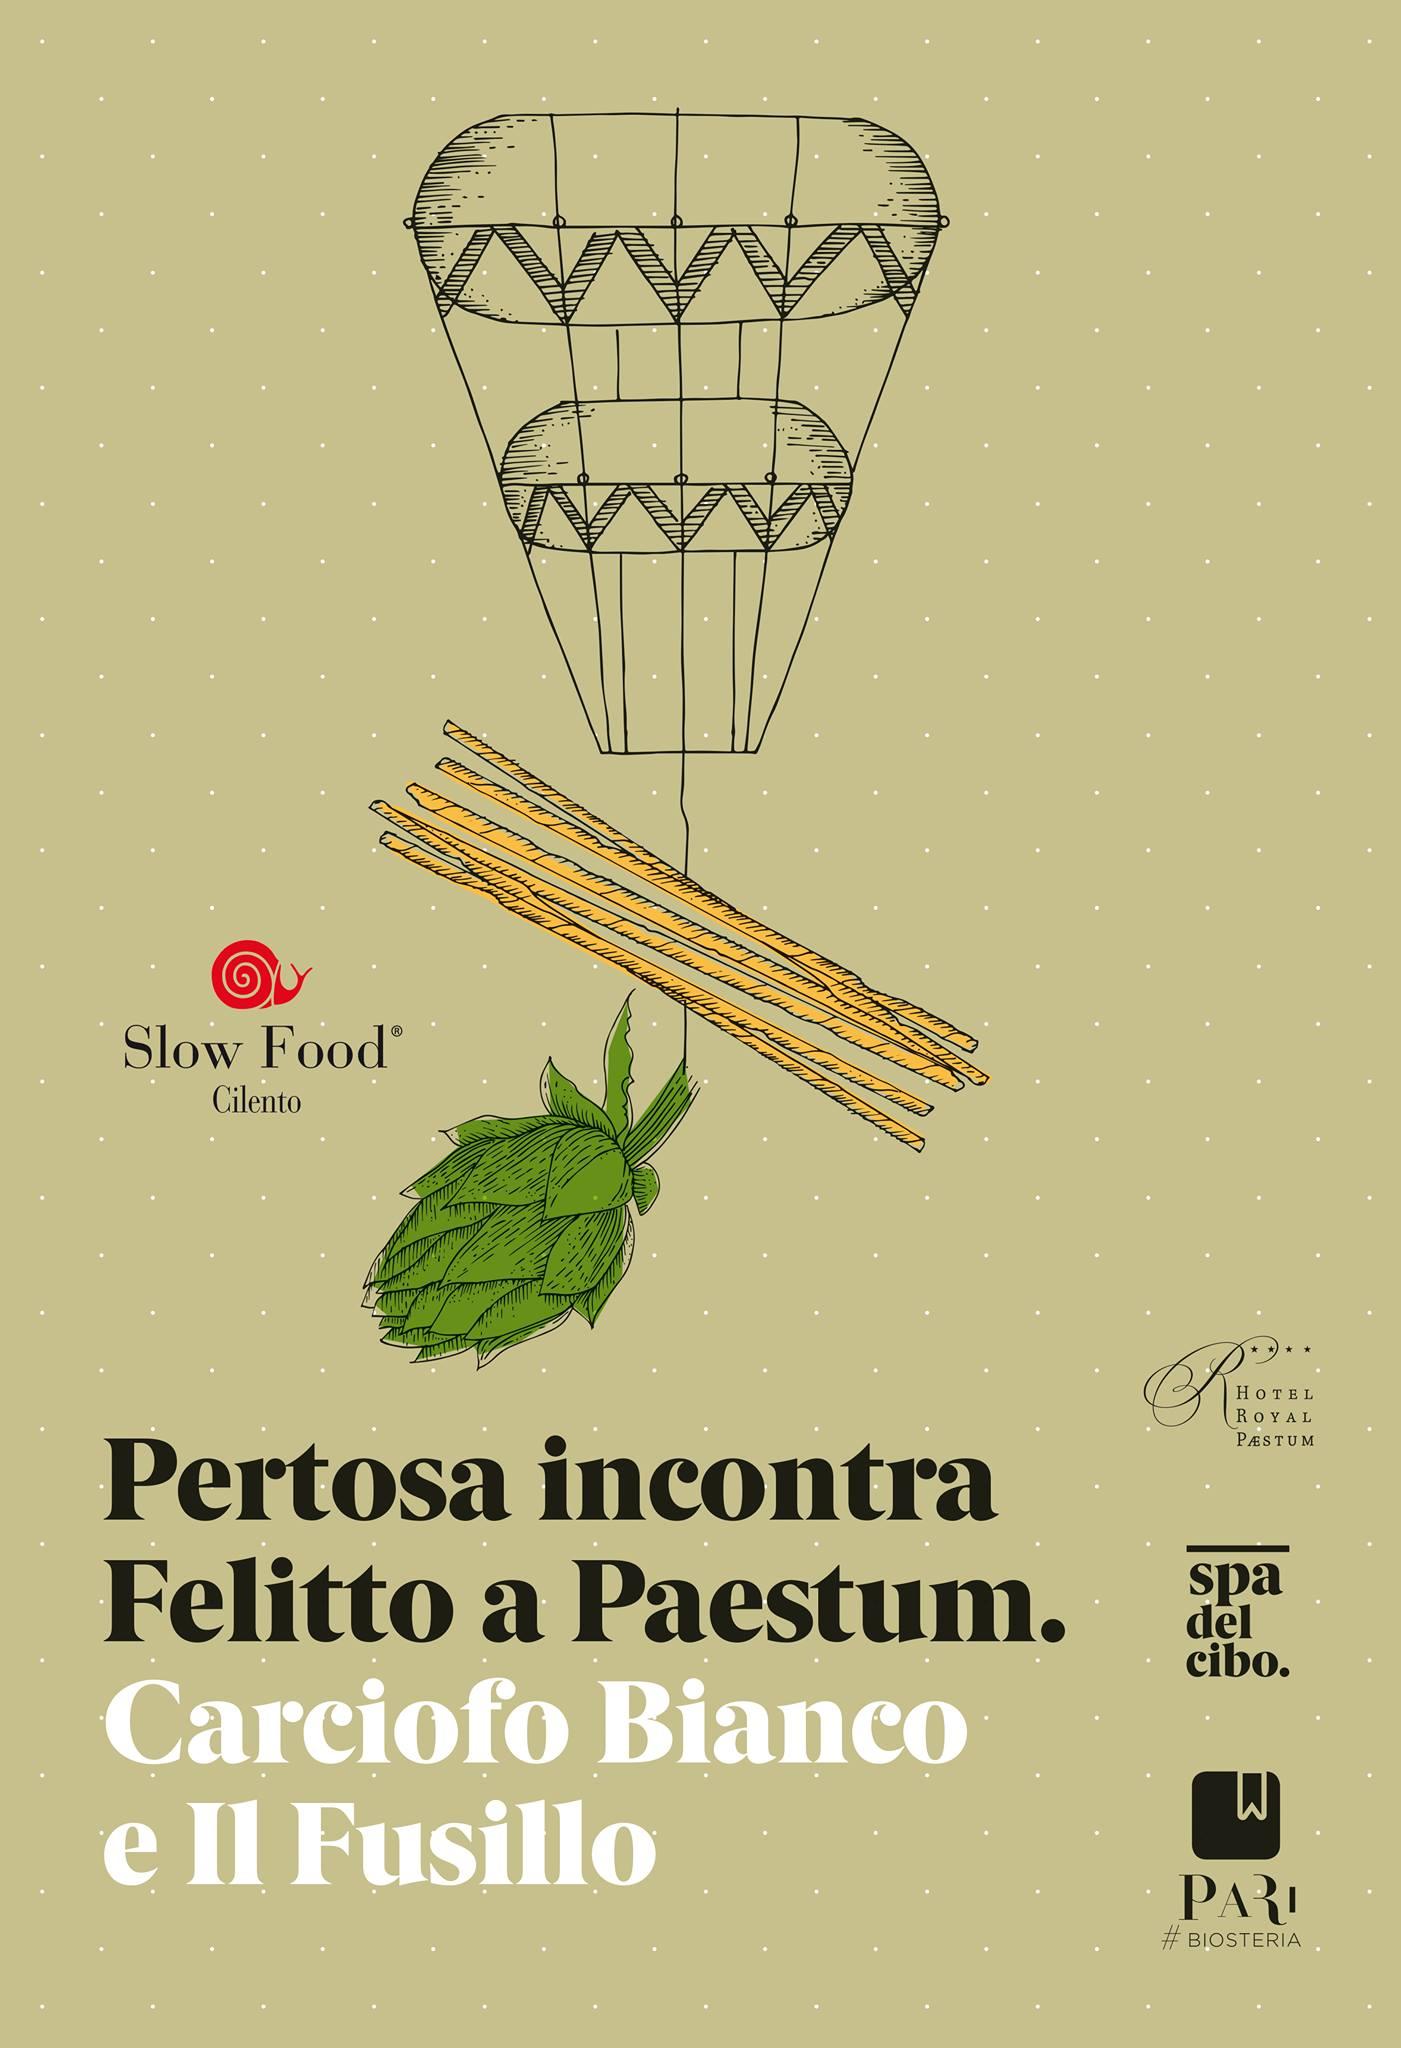 Il 25 aprile un pranzo a Paestum con Slow Food Cilento